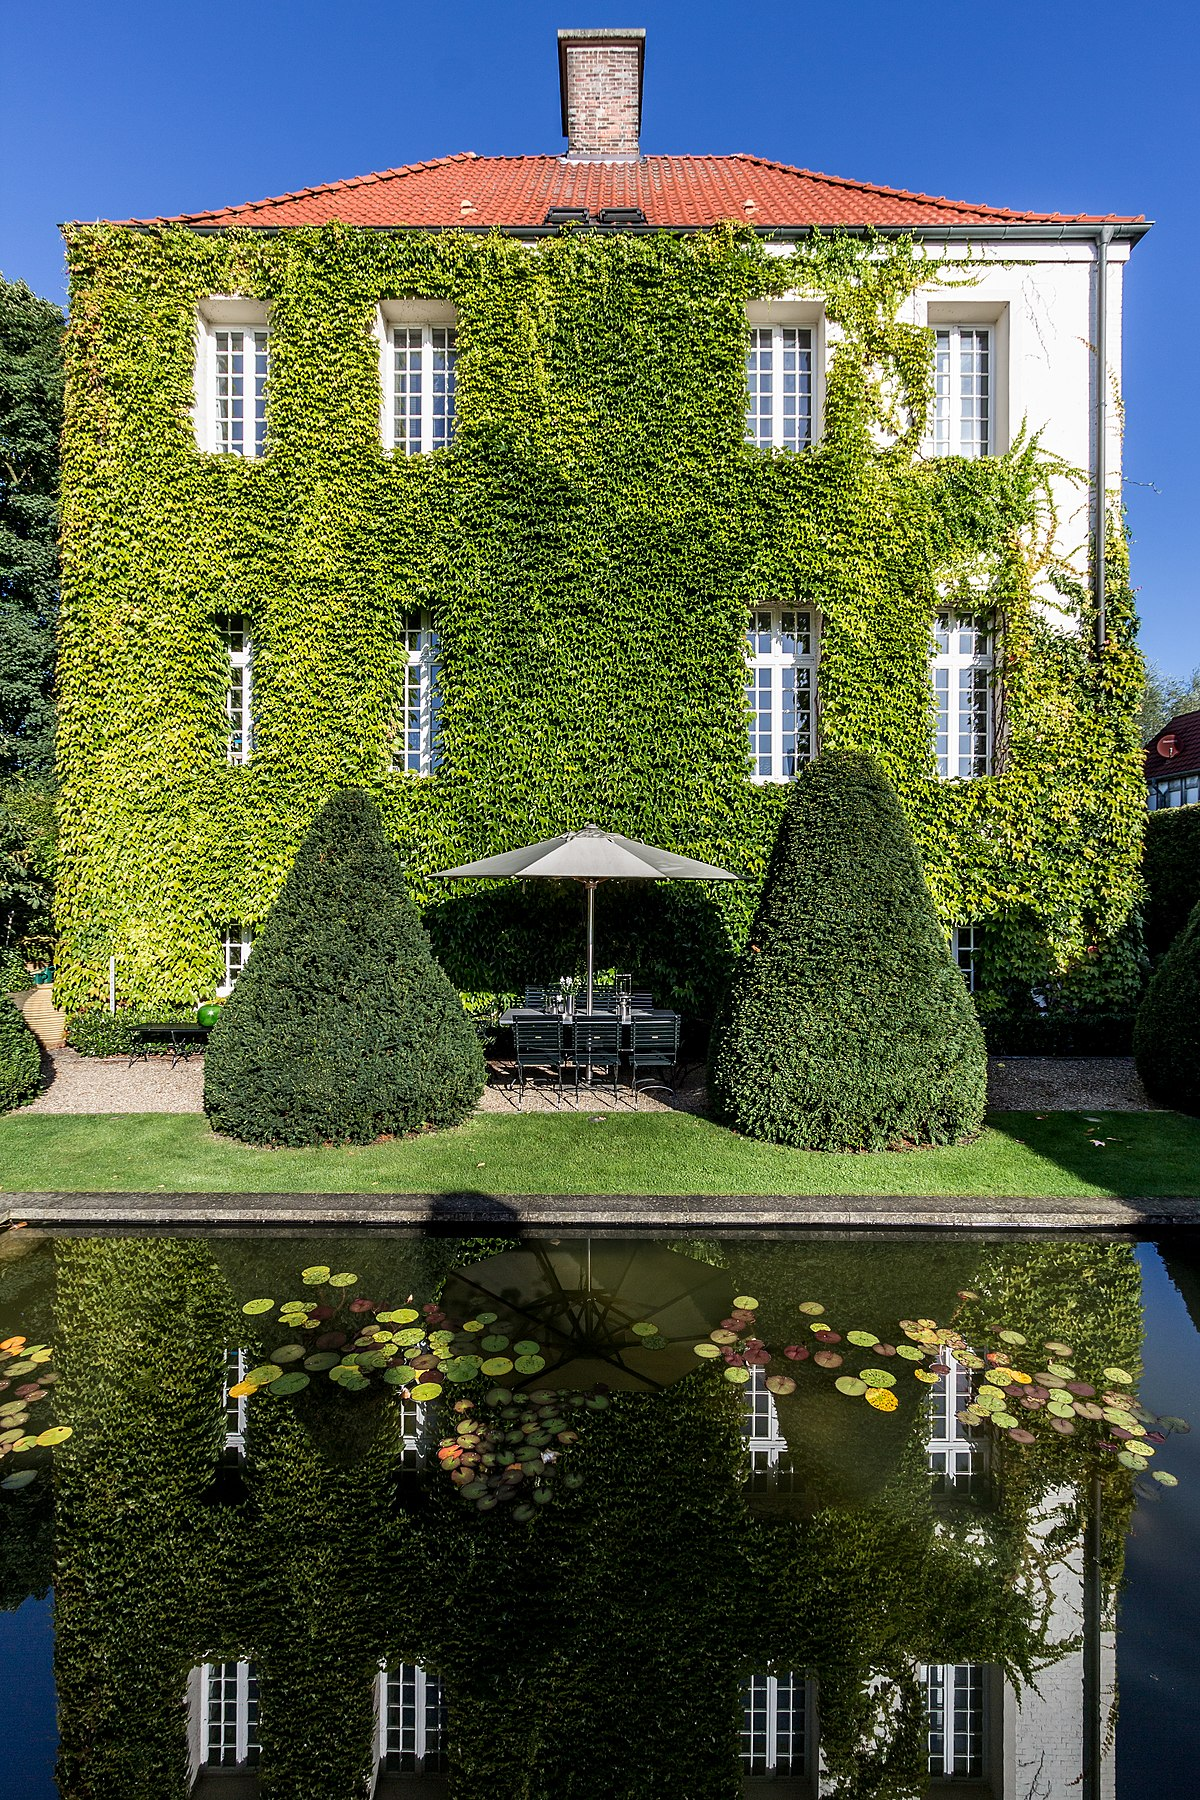 Haus osthoff wikipedia - Beruhmte architekten des 21 jahrhunderts ...